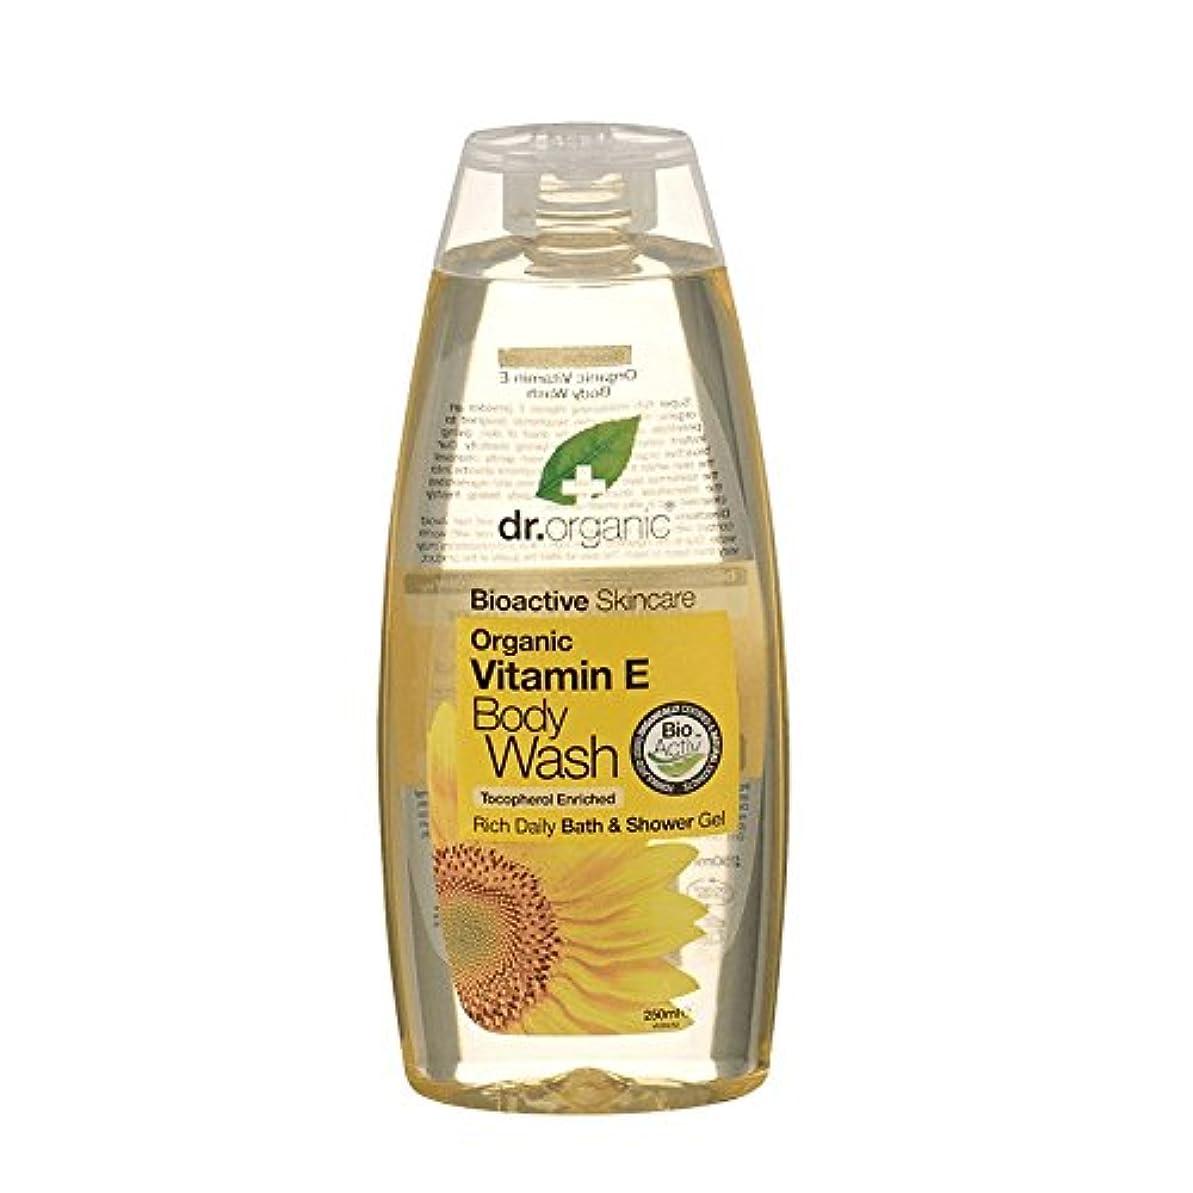 Dr Organic Vitamin E Body Wash (Pack of 6) - Dr有機ビタミンEボディウォッシュ (x6) [並行輸入品]